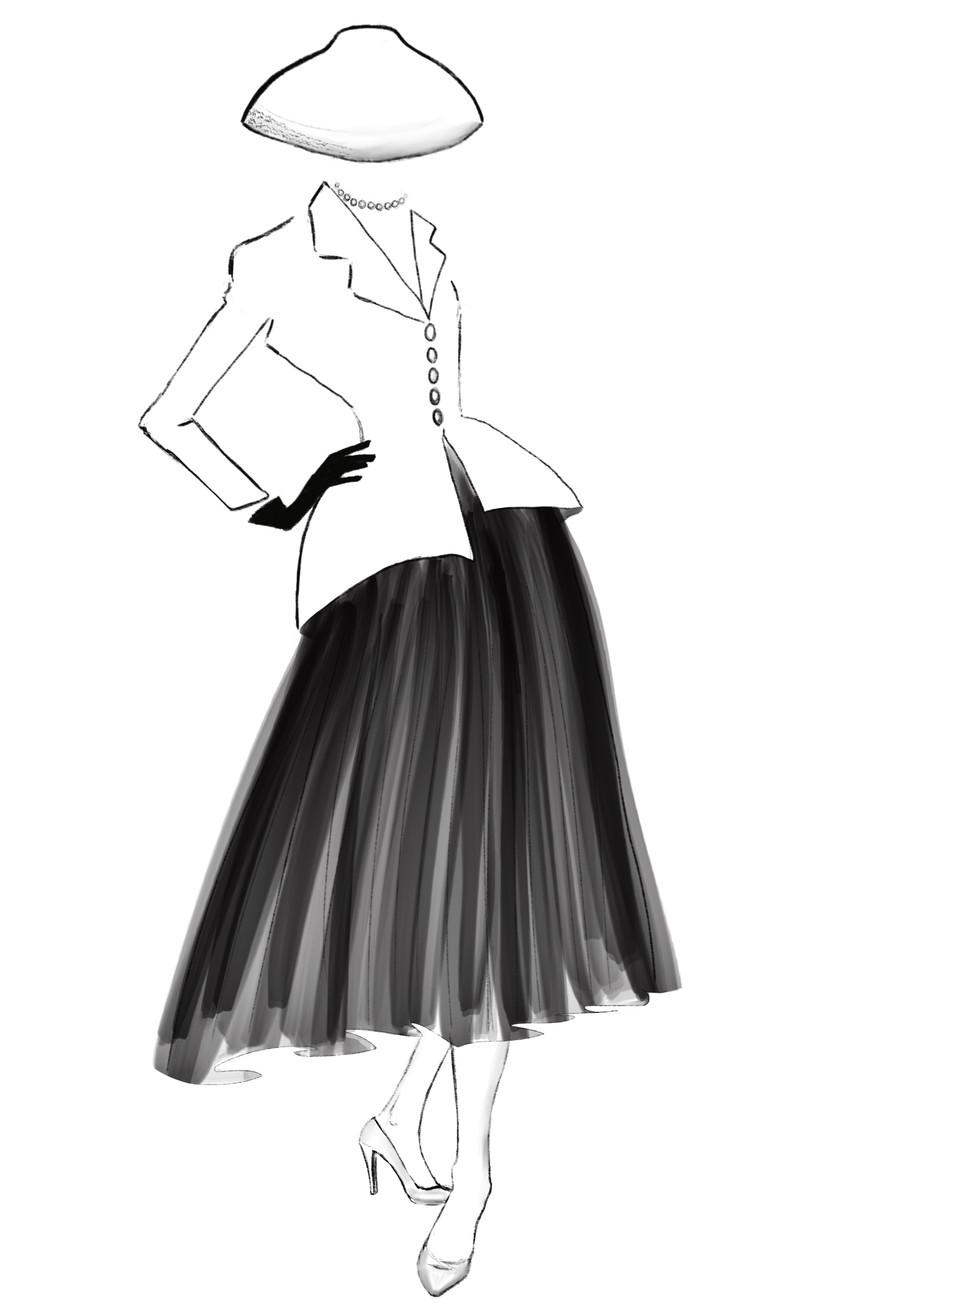 Dior Suit 1940.jpg